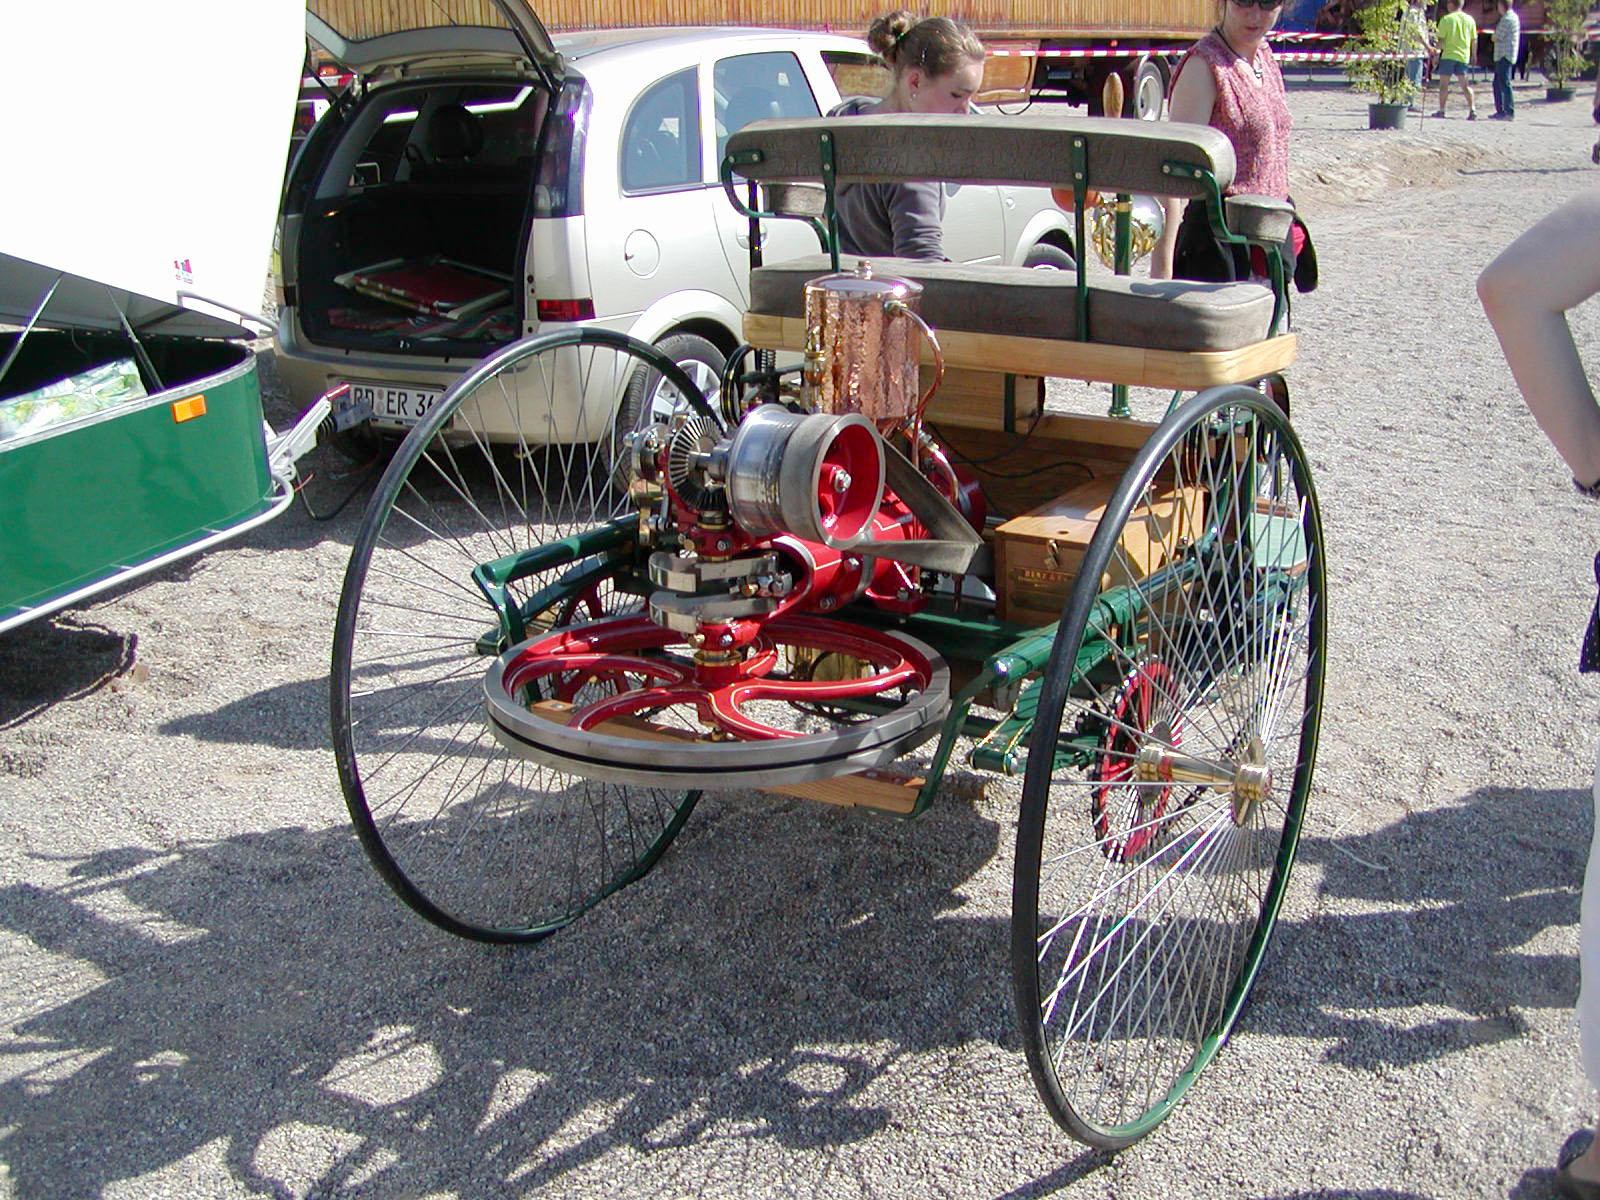 benz patent motorwagen - photo #24